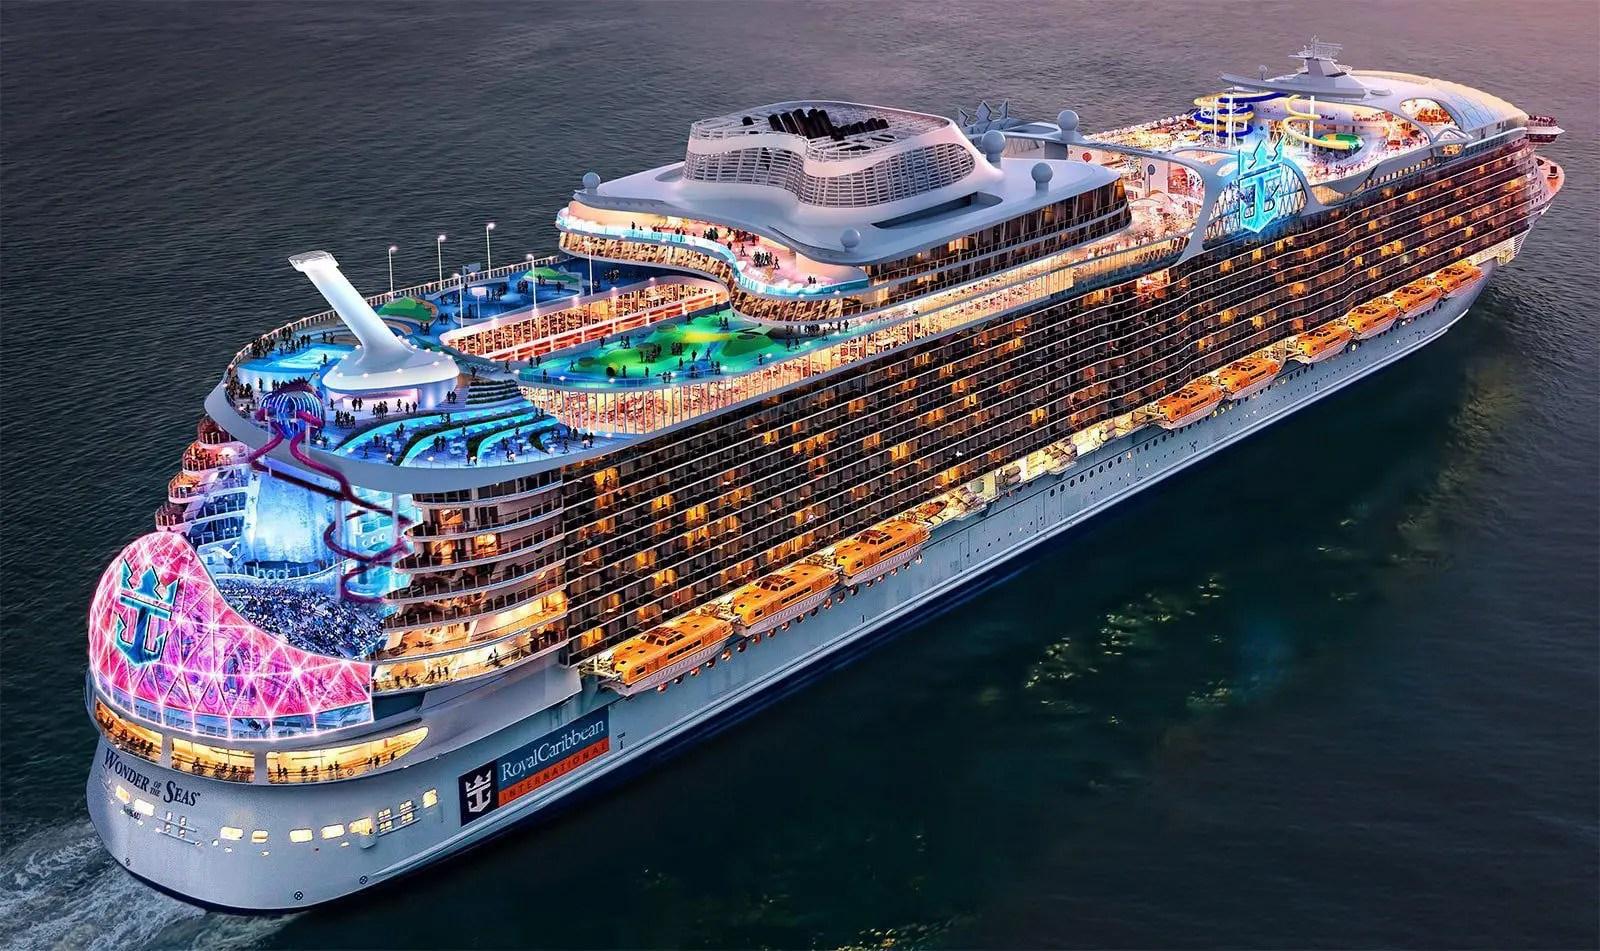 RCL Wonder of the Seas